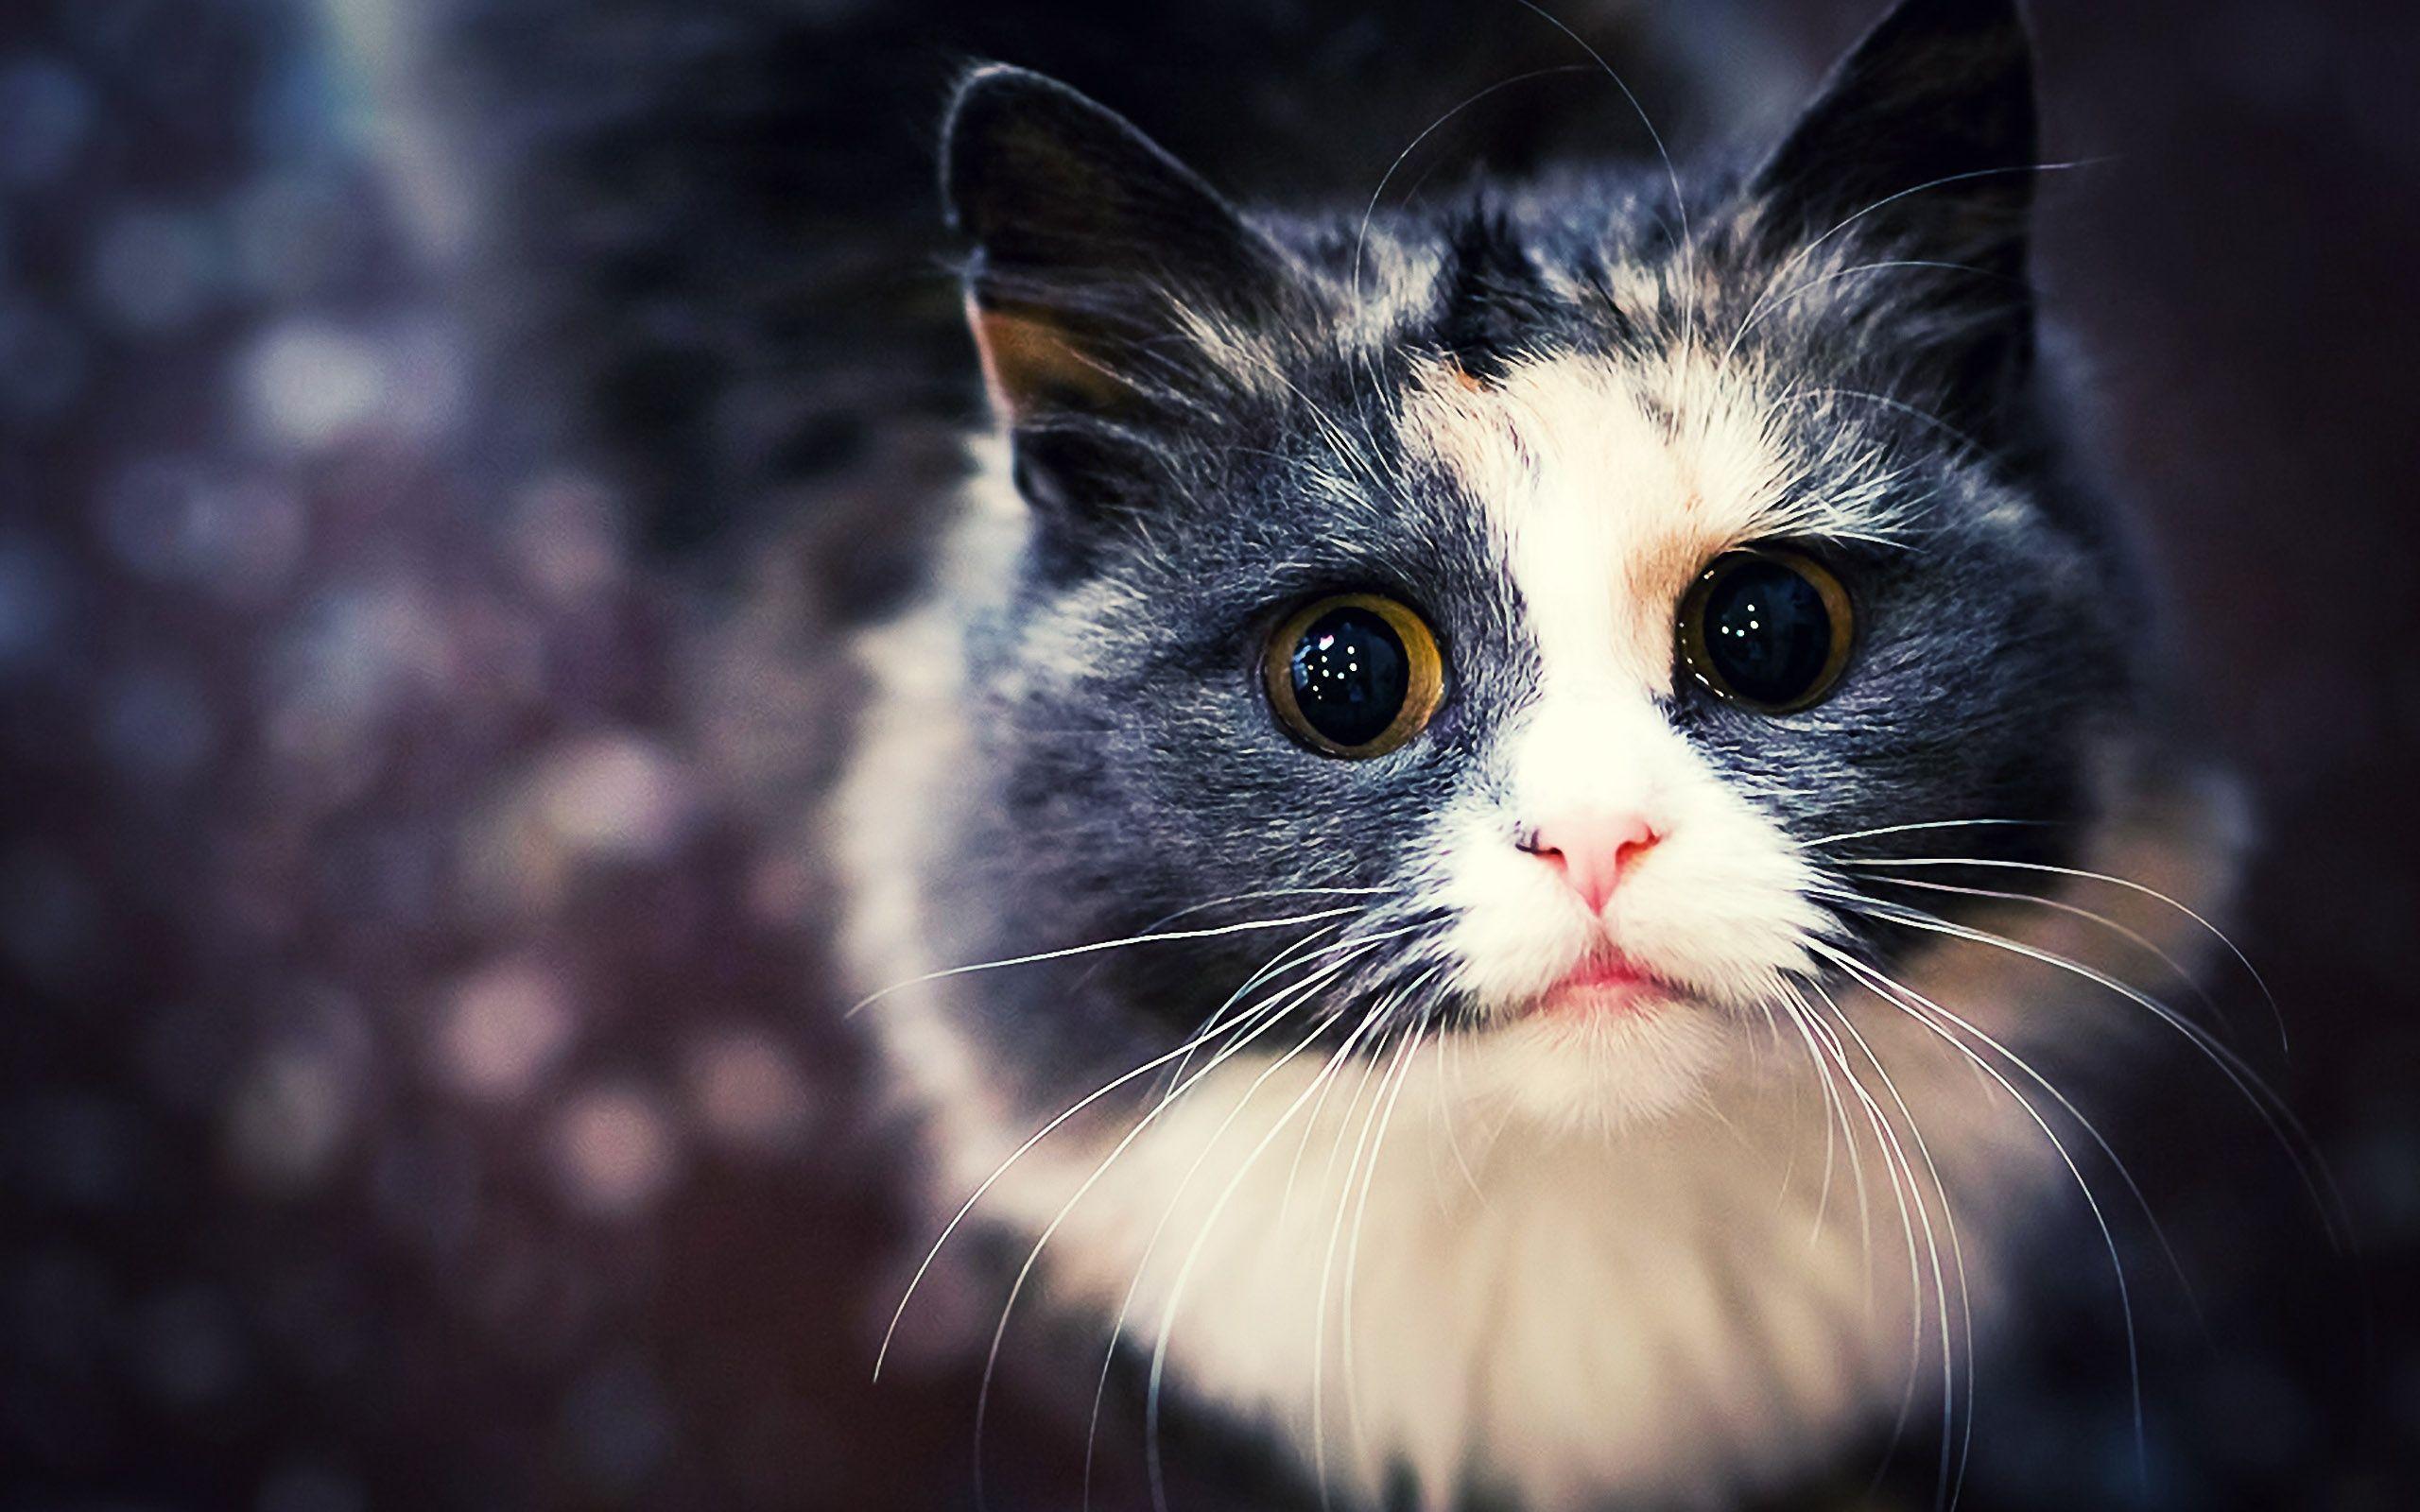 cat hd wallpapers : animal wallpaper - horadent | cats & kittens